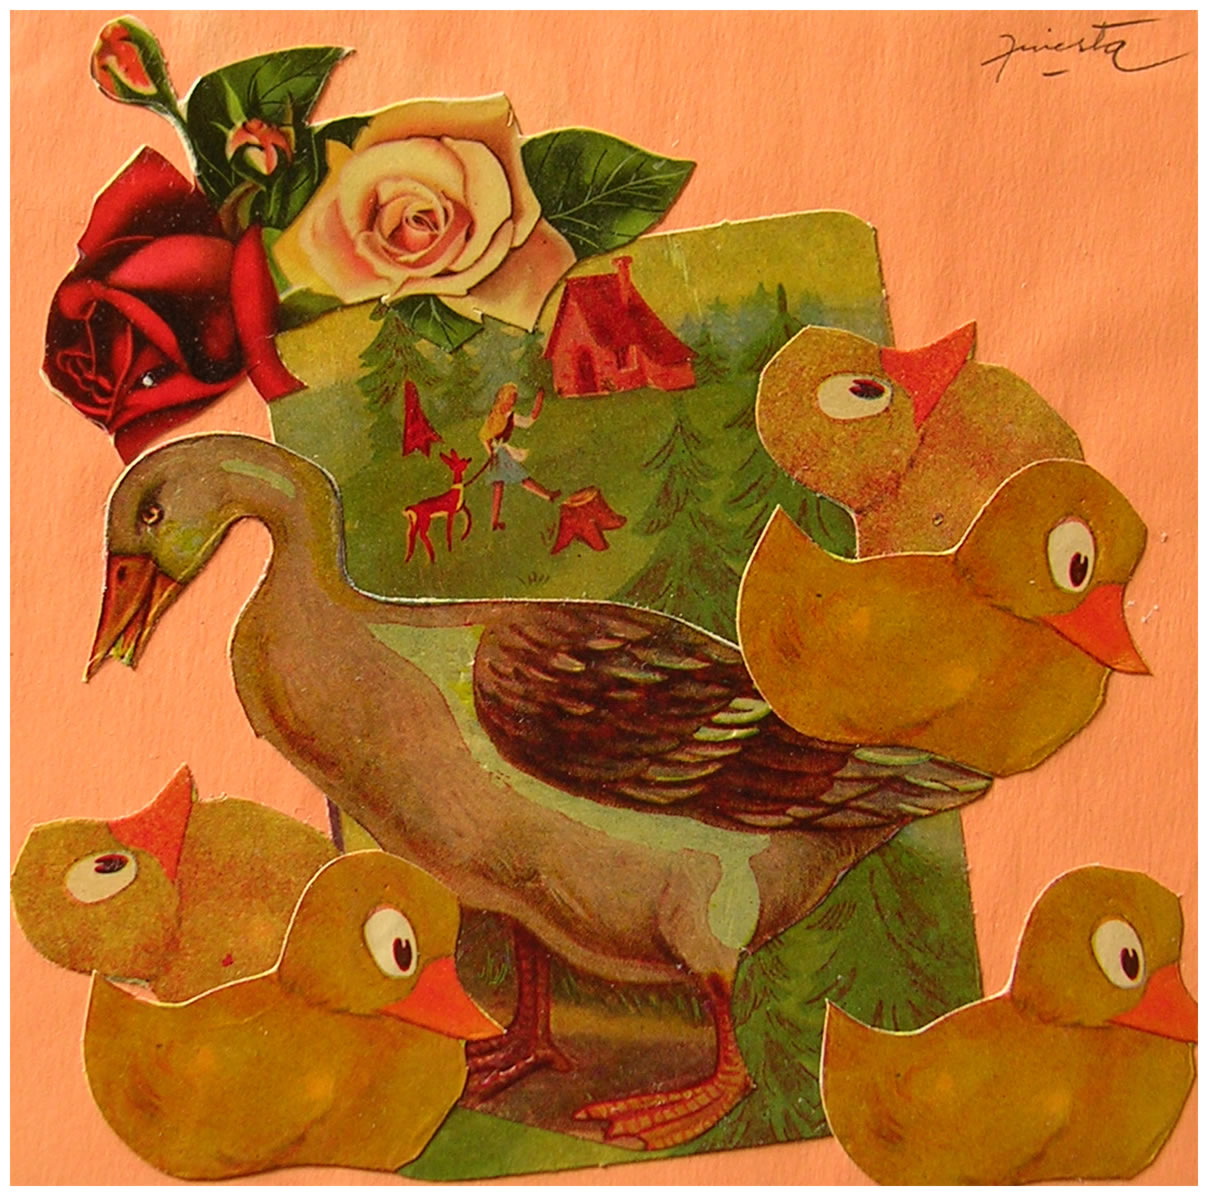 Pata y patos,  papel collage, 15 cm x 15 cm, 1999